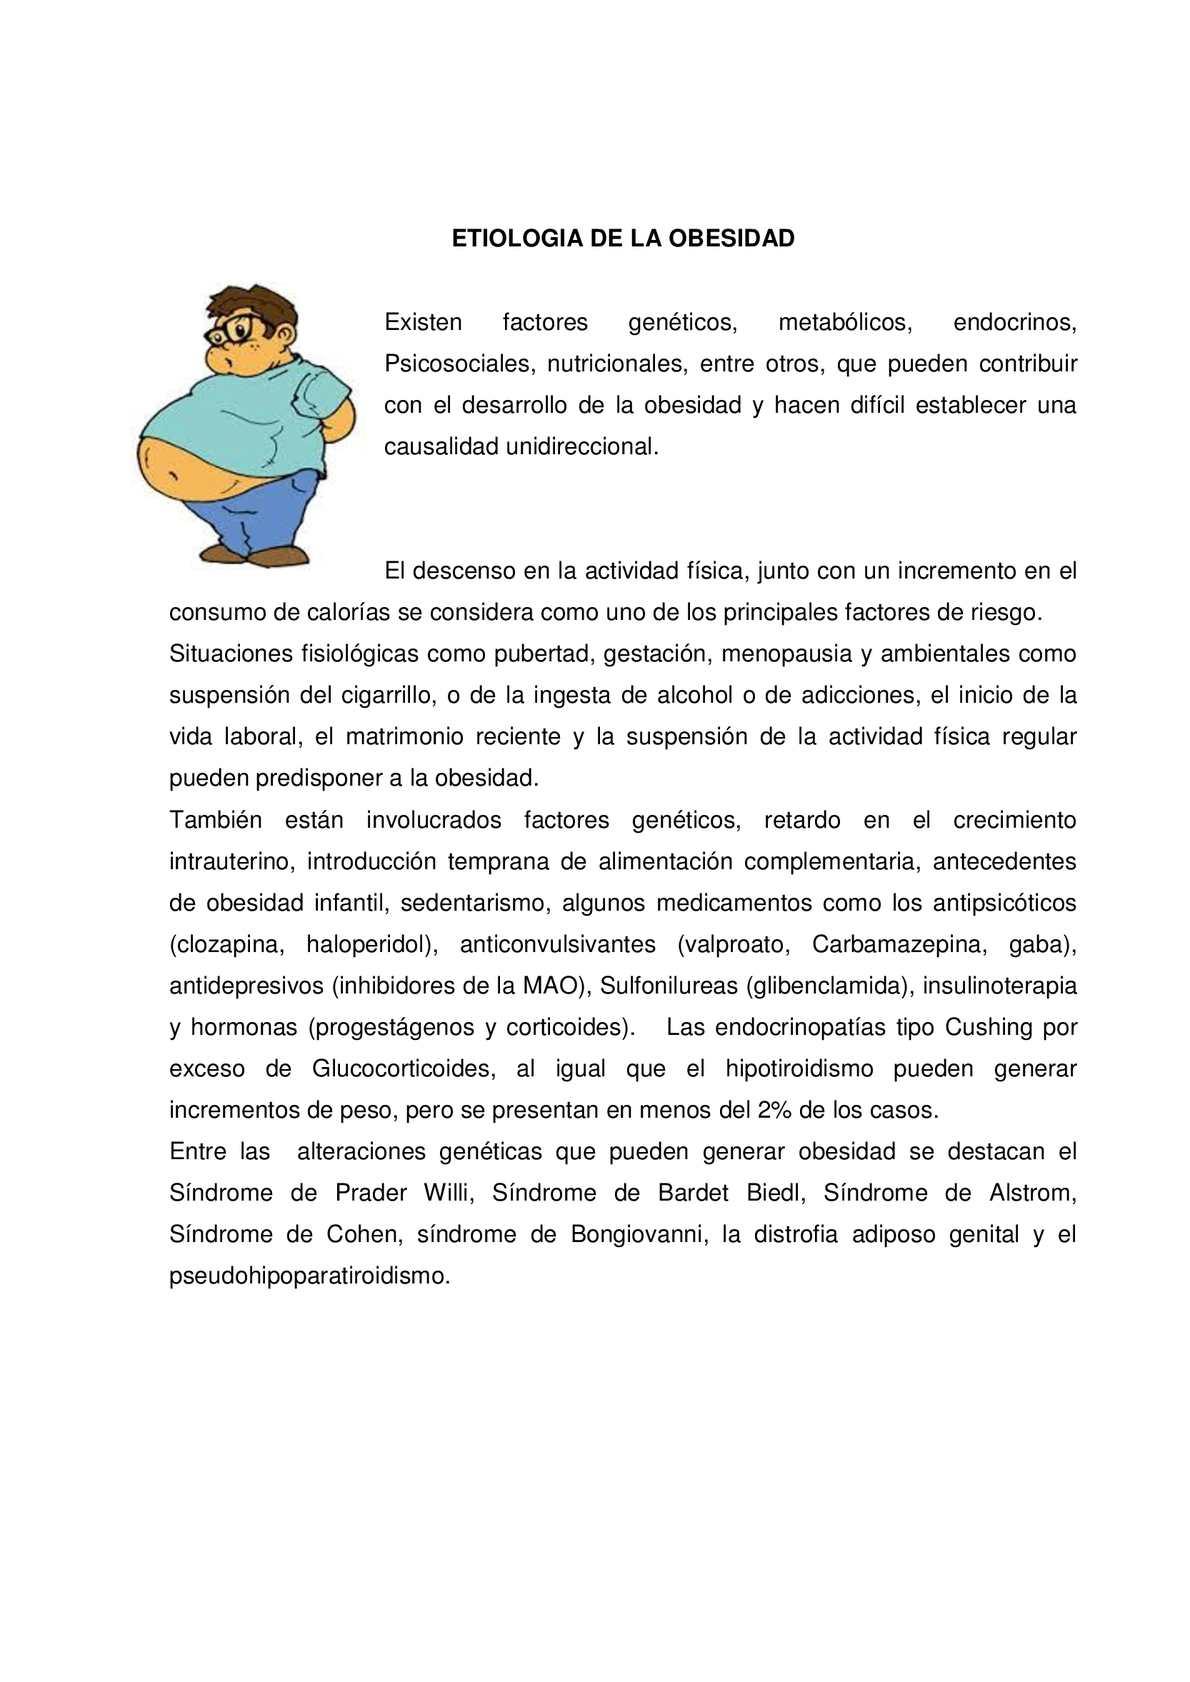 dieta para obesidad androide